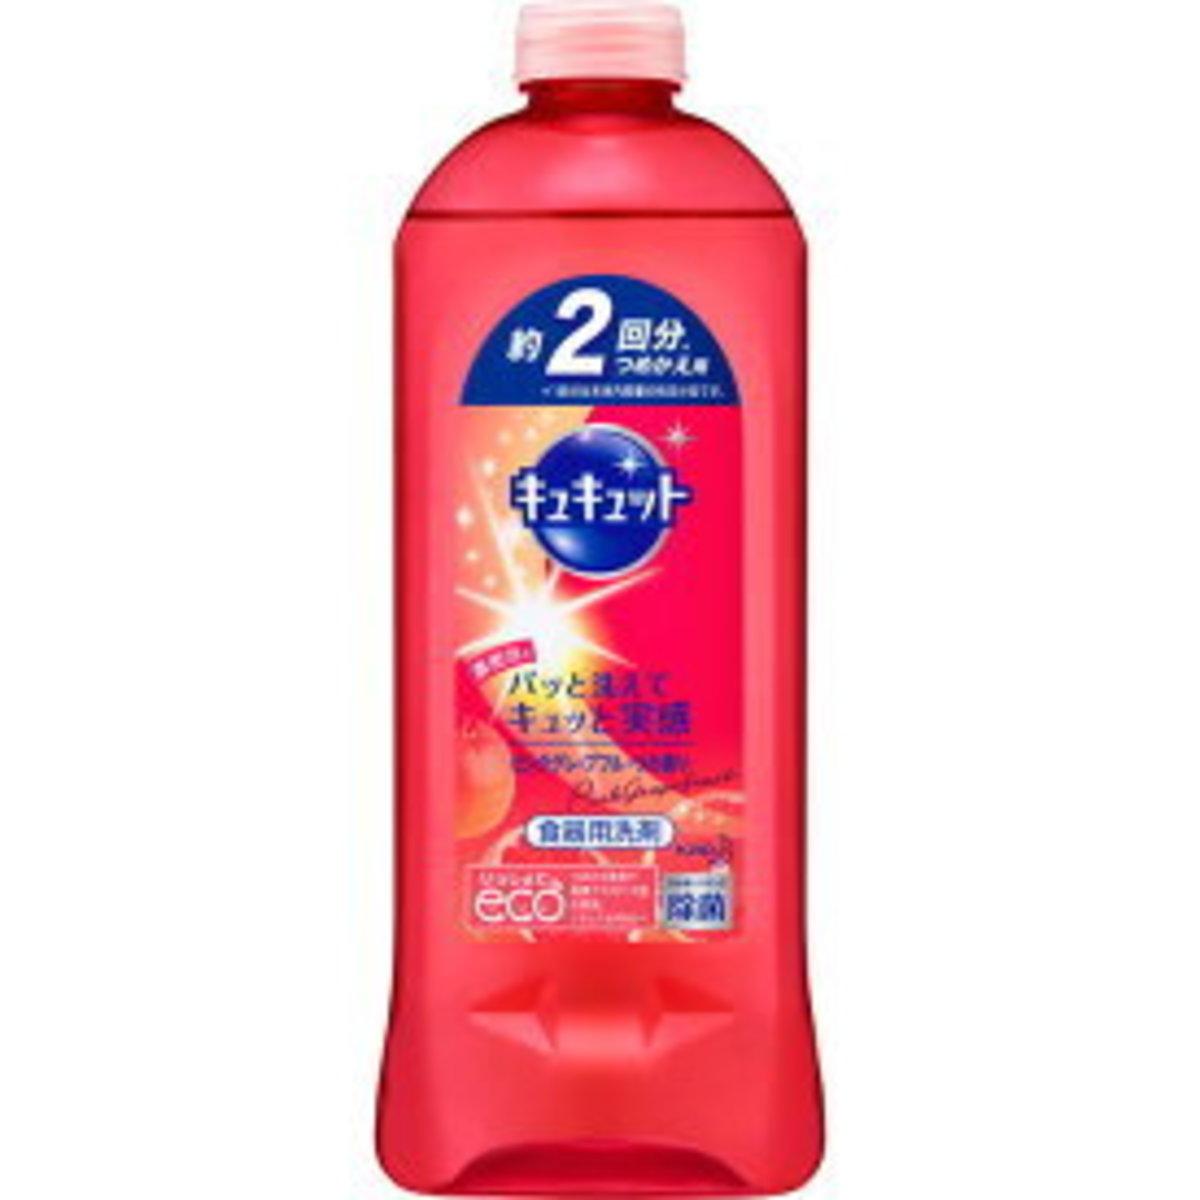 Cucute super-concentrated detergent sterilization (red grapefruit) 385ml supplement village